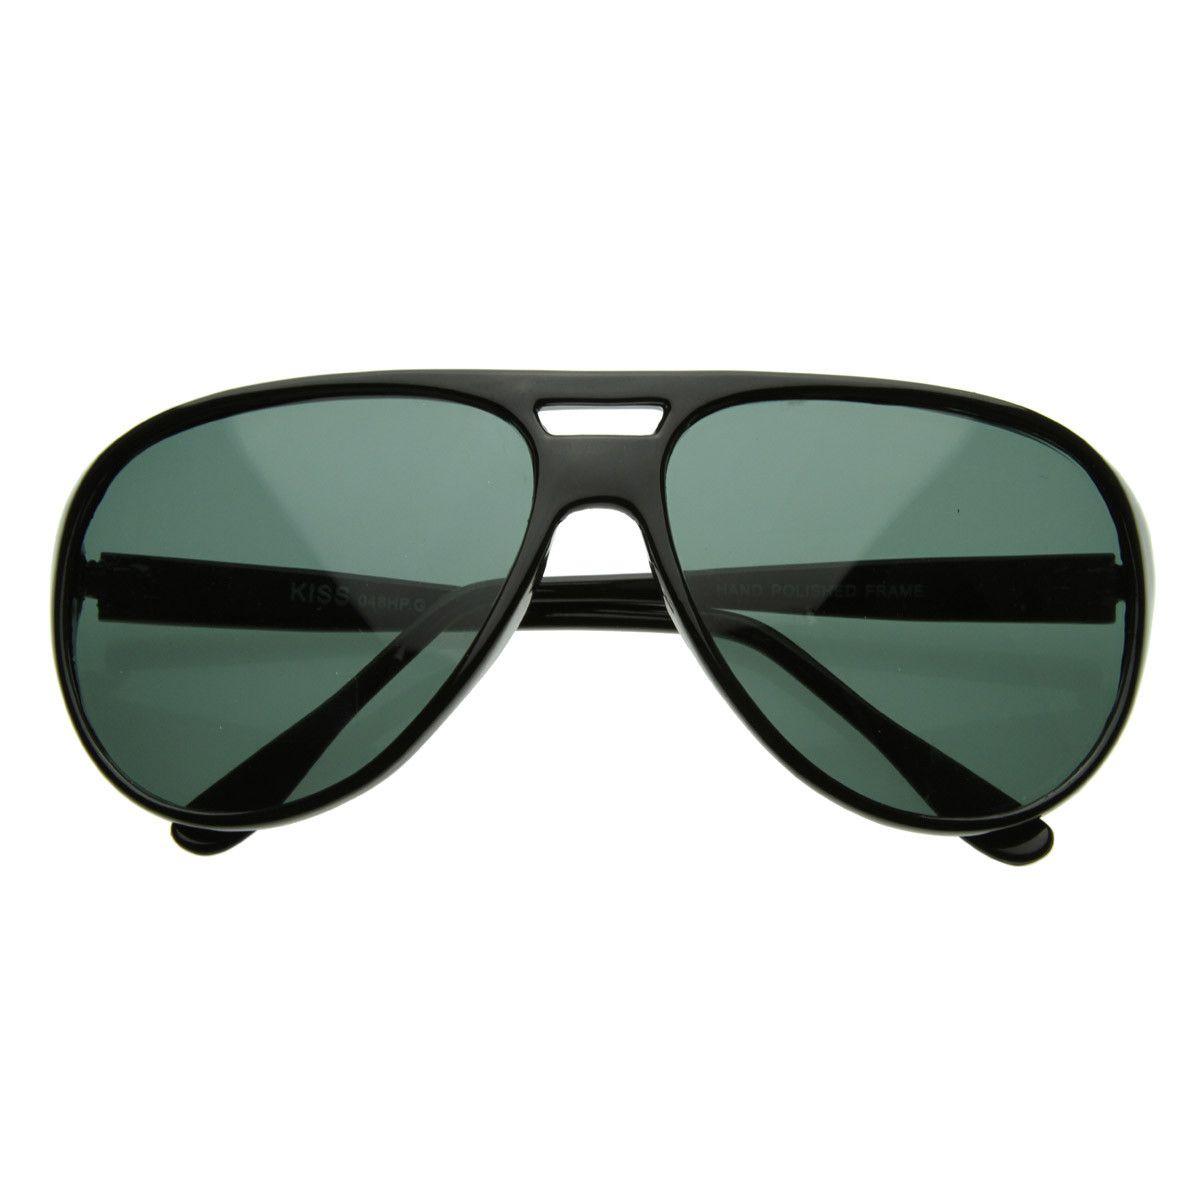 Retro Fashion Sunglasses Square Plastic Frame Unisex Aviators Mirror Lens